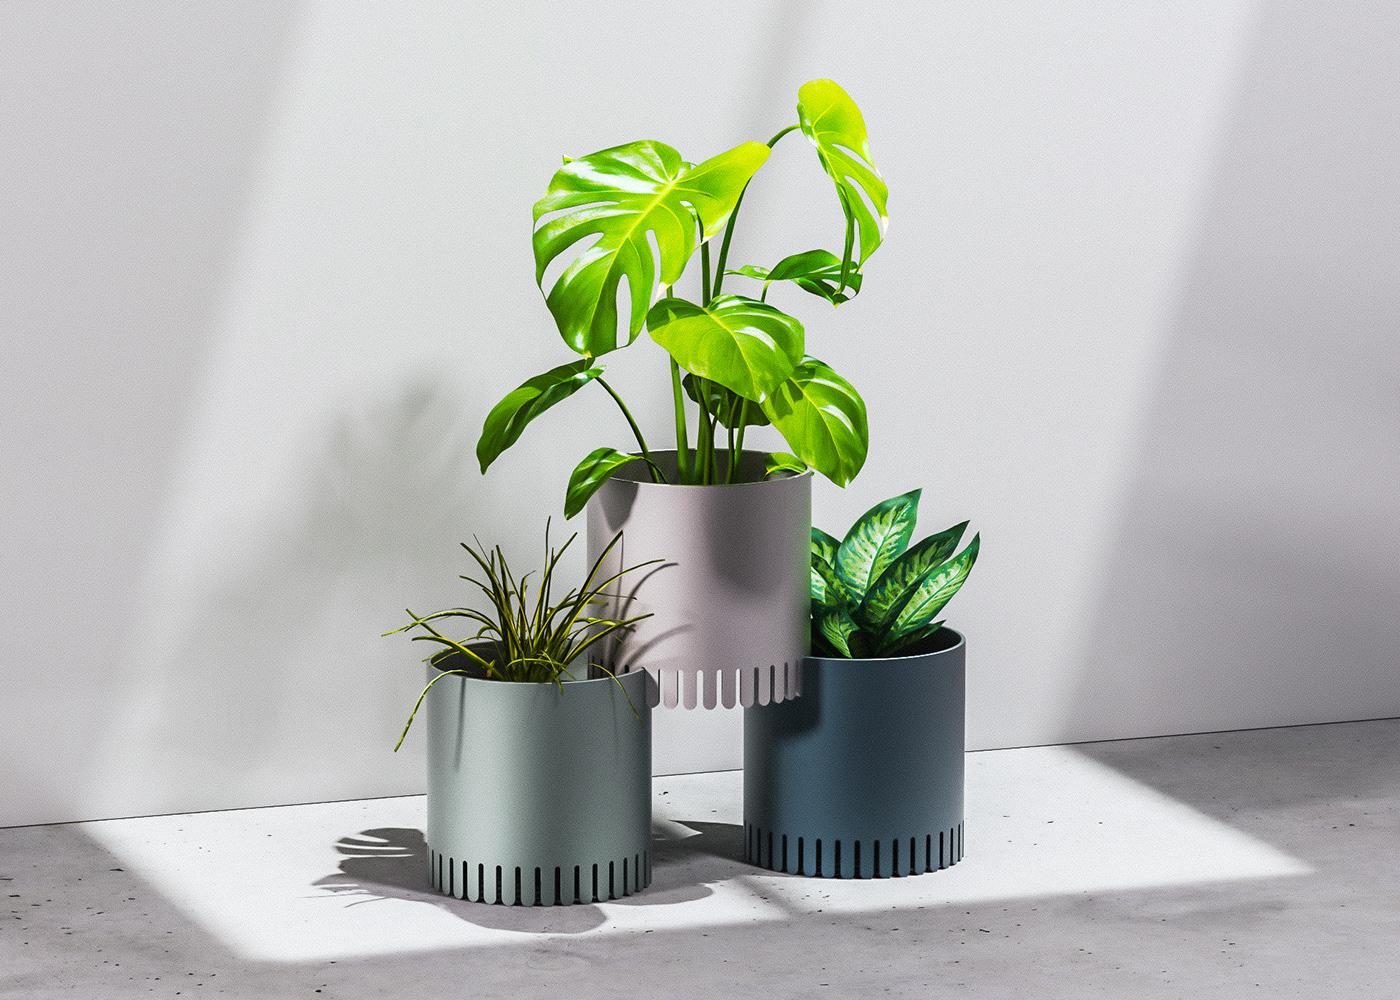 clean home goods housewares minimal modular modularity Planter planters plants simple